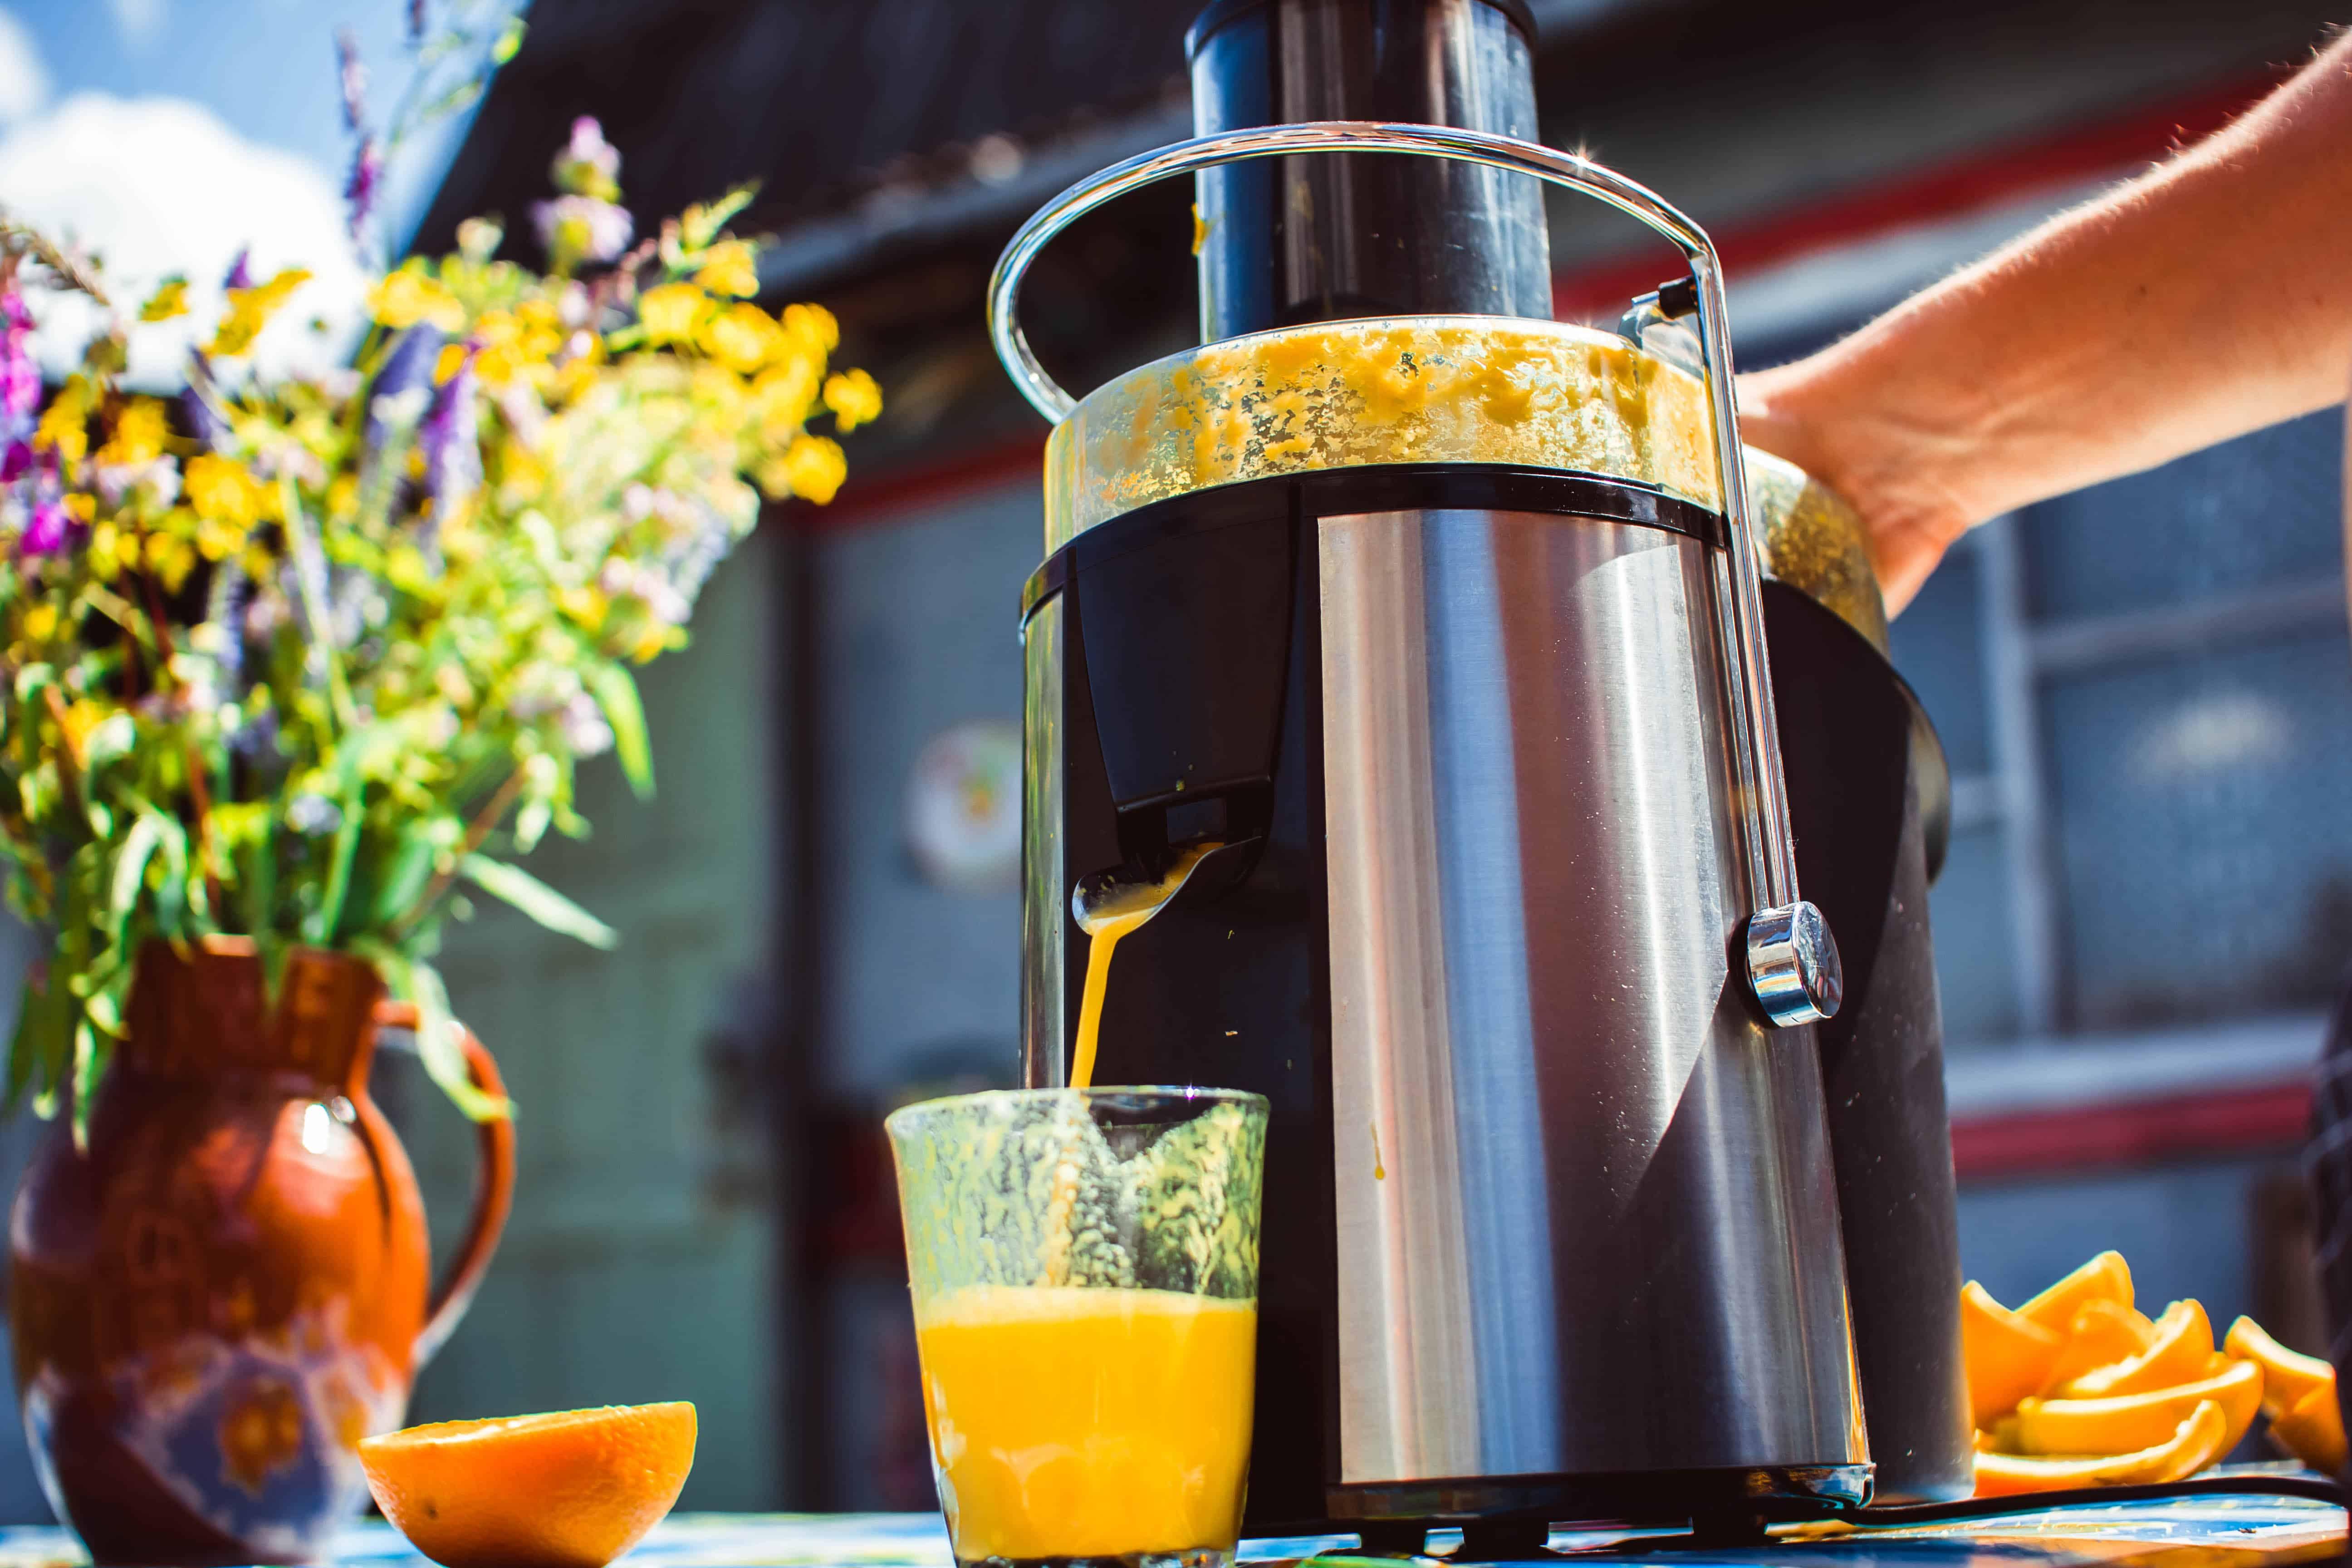 centrifugal juicer juicing oranges